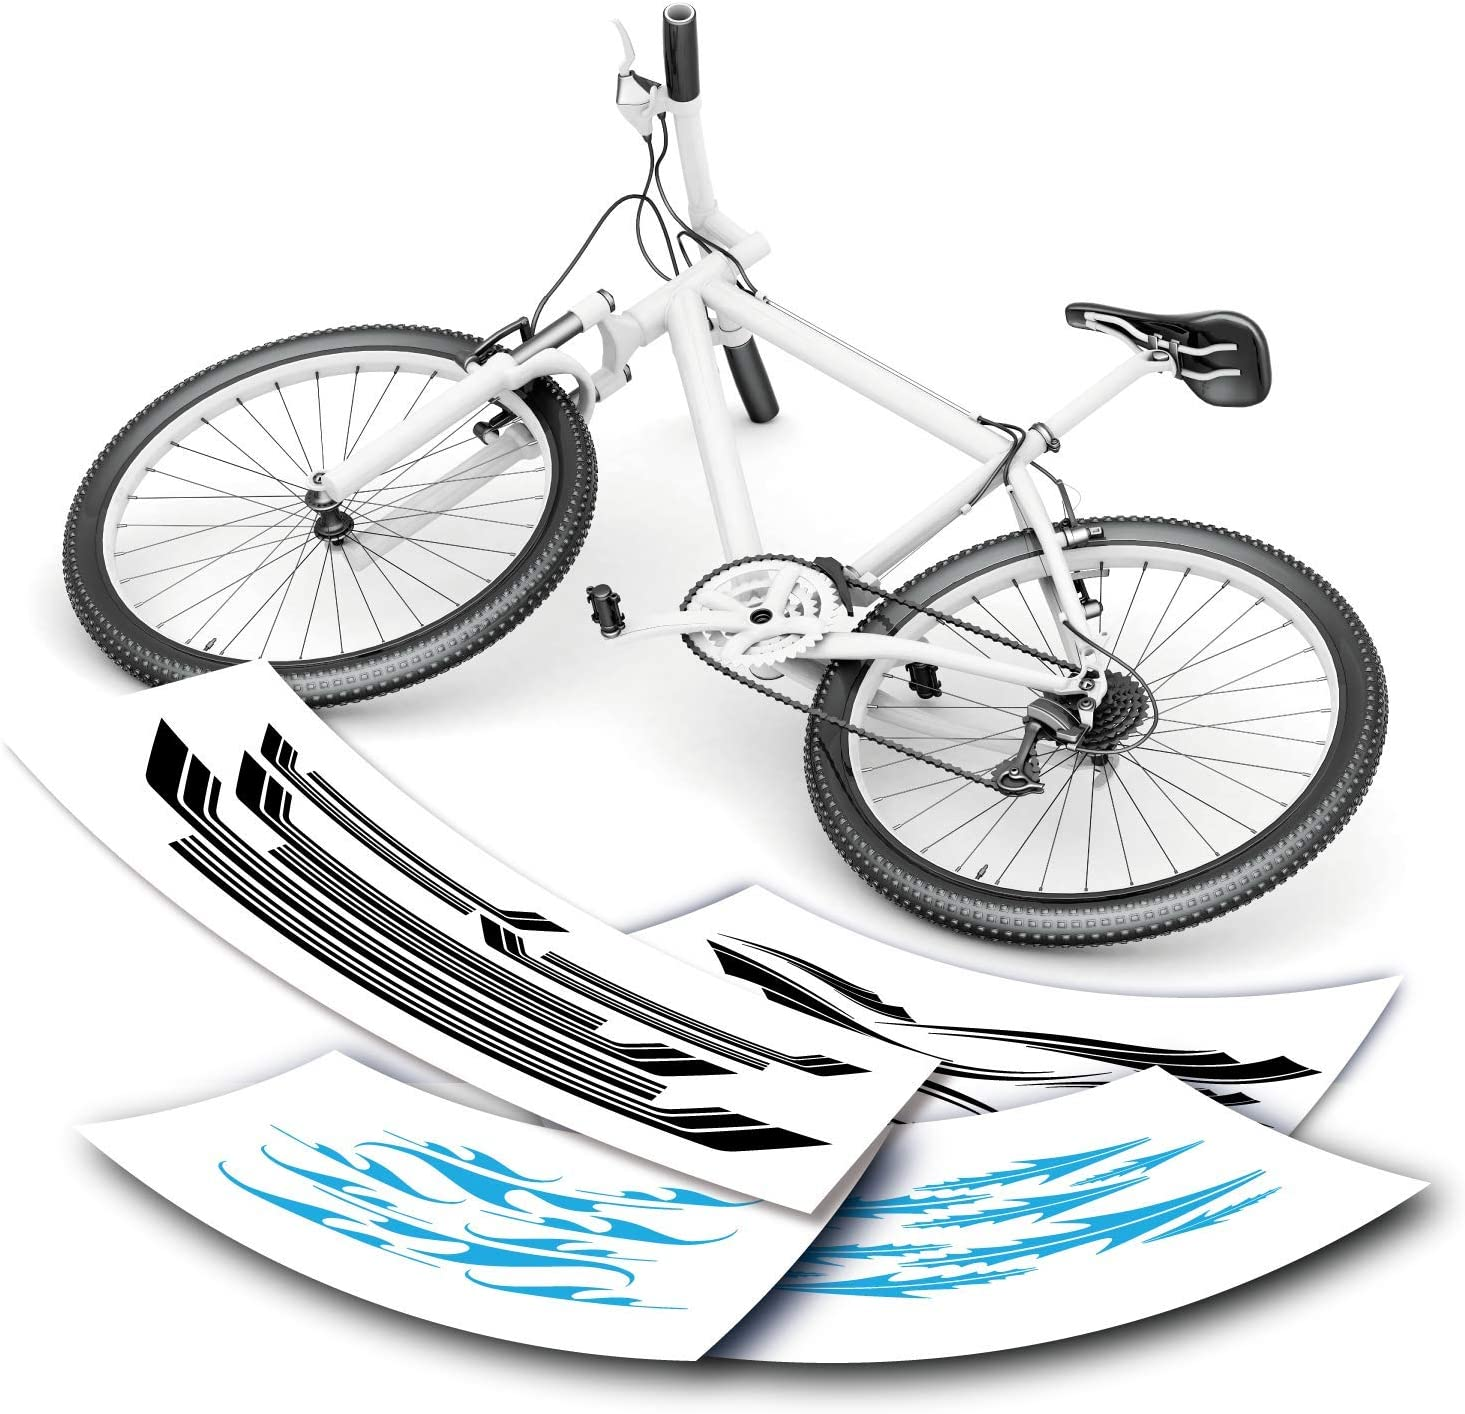 Set 2 Transfers Aufklebe Ortelli Fahrrad Abziehbilder